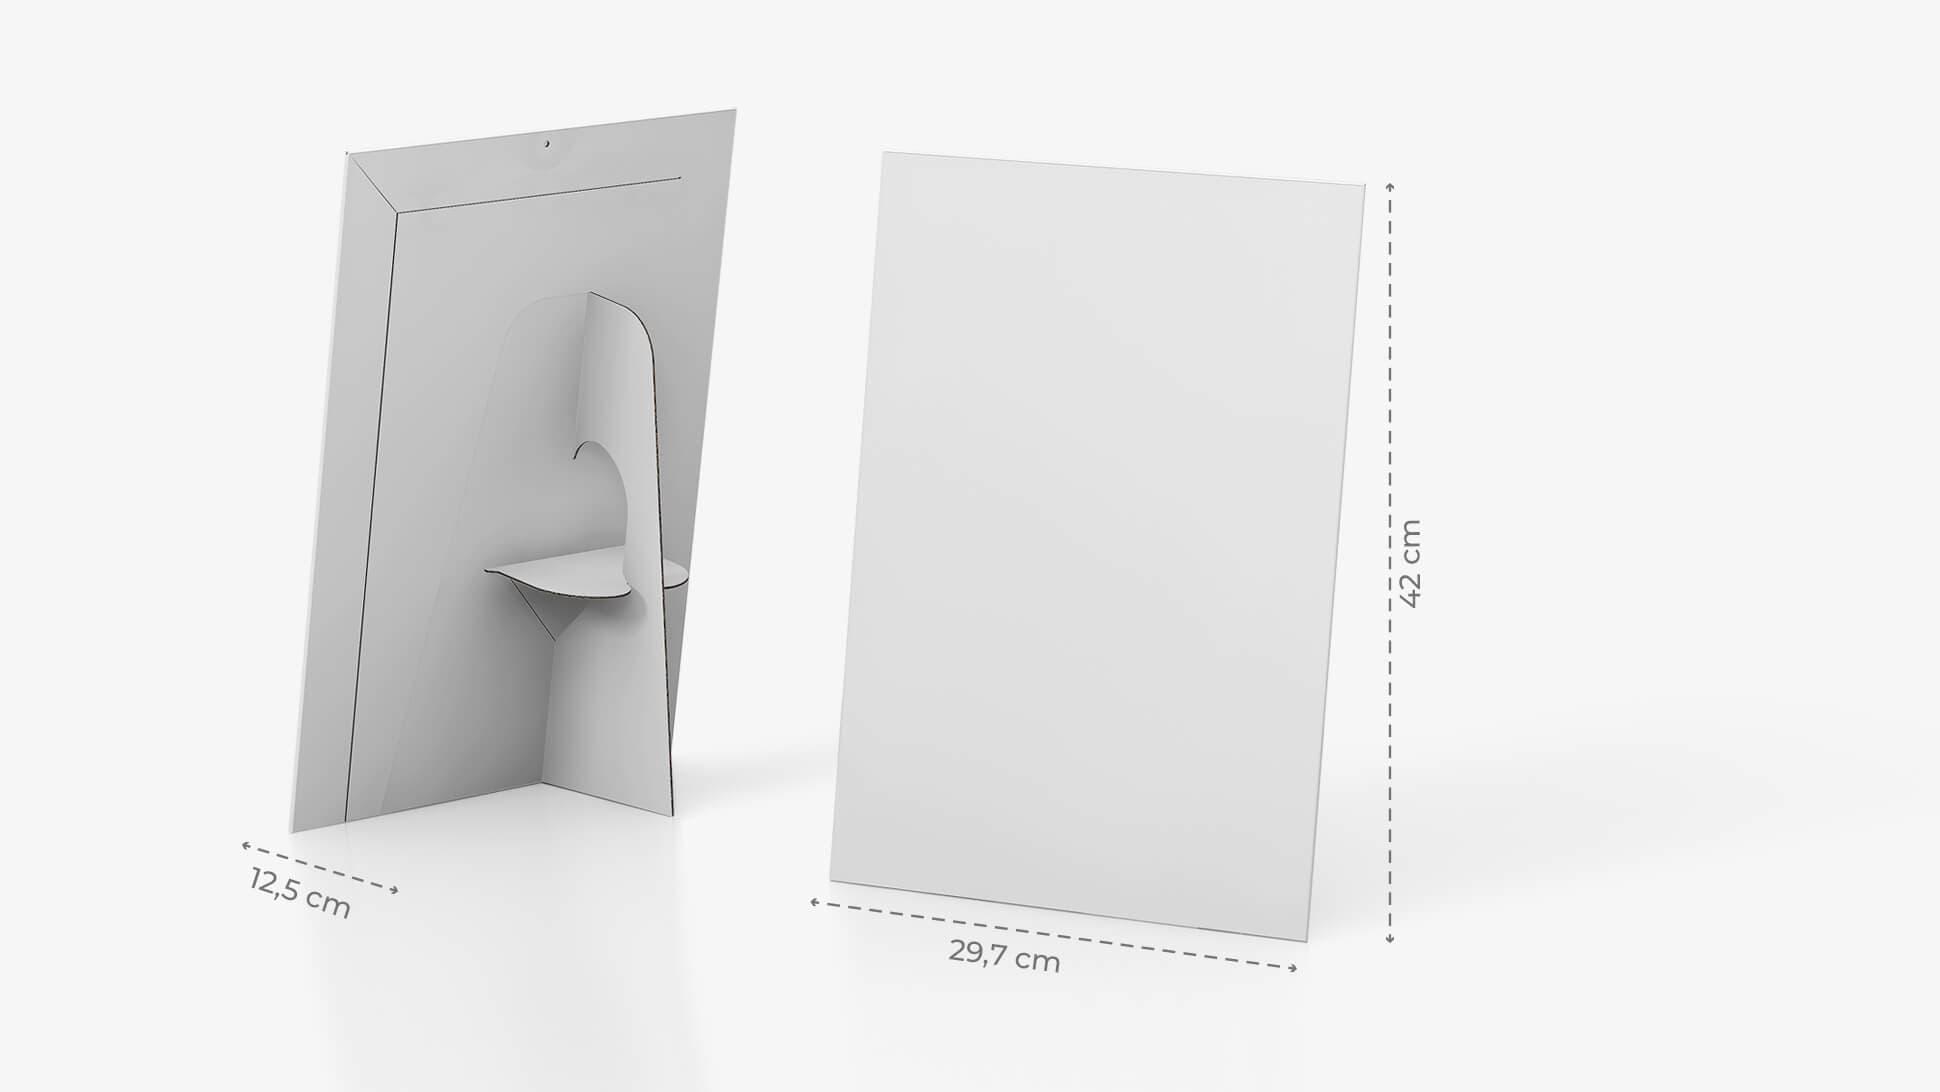 Display monofacciale 70x49 cm personalizzabile | tictac.it